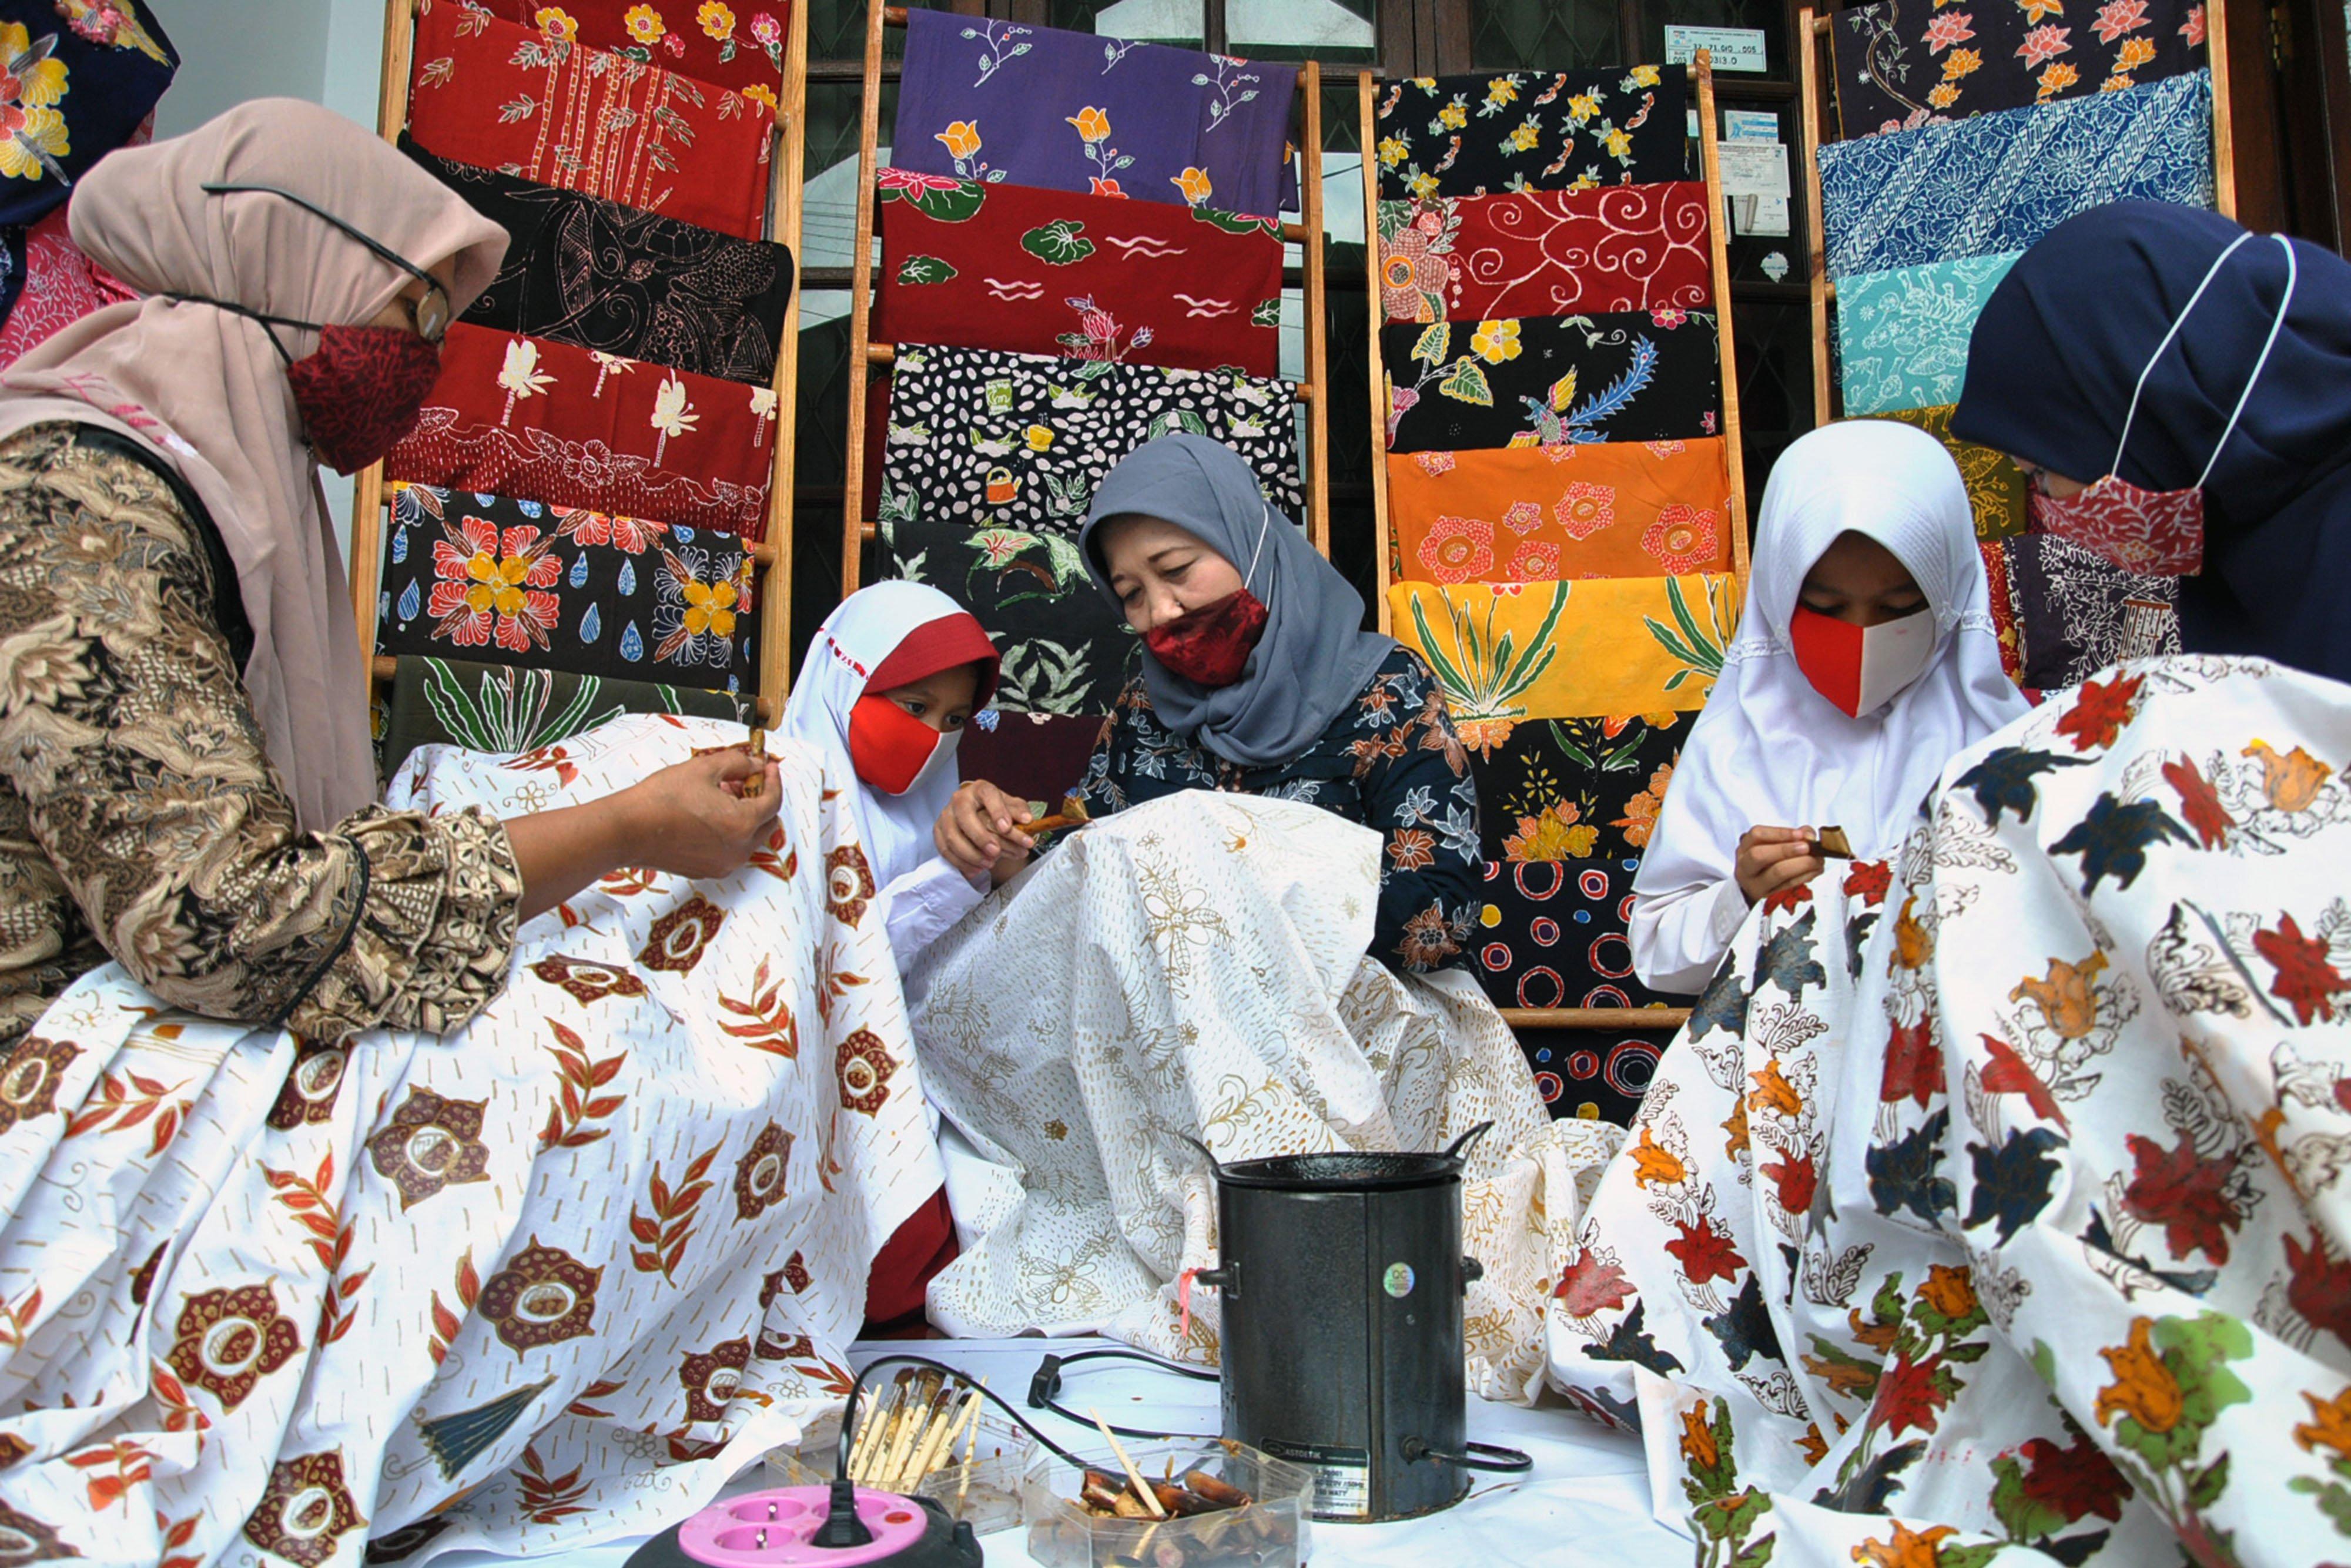 Perajin mengajarkan siswa SD membatik di Kampung Batik Neglasari, Cibuluh, Kota Bogor, Jawa Barat, Jumat (2/10/2020). Kegiatan belajar membatik dan menari di kampung batik Cibuluh tersebut selain untuk mengisi waktu di masa pandemi COVID-19 sekaligus mengenalkan dan melestarikan budaya serta batik tulis khas Bogor kepada generasi muda. ANTARA FOTO/Arif Firmansyah/wsj.